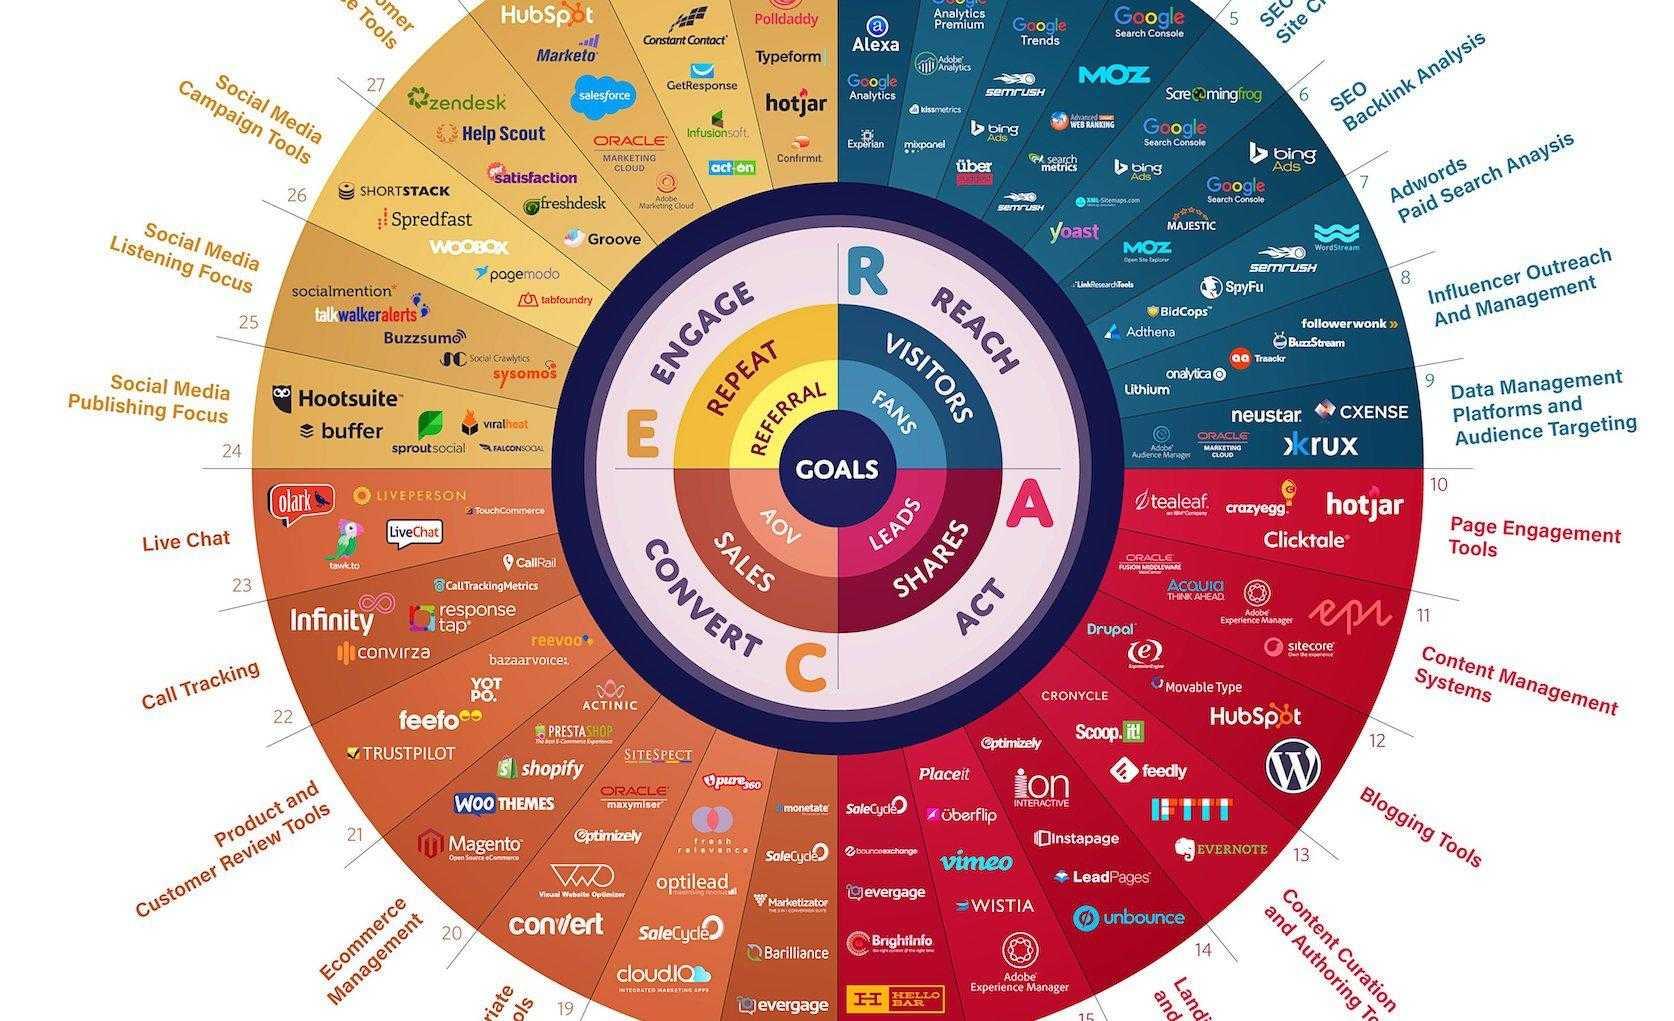 Una lista completa dei tool indispensabili per fare Digital Marketing